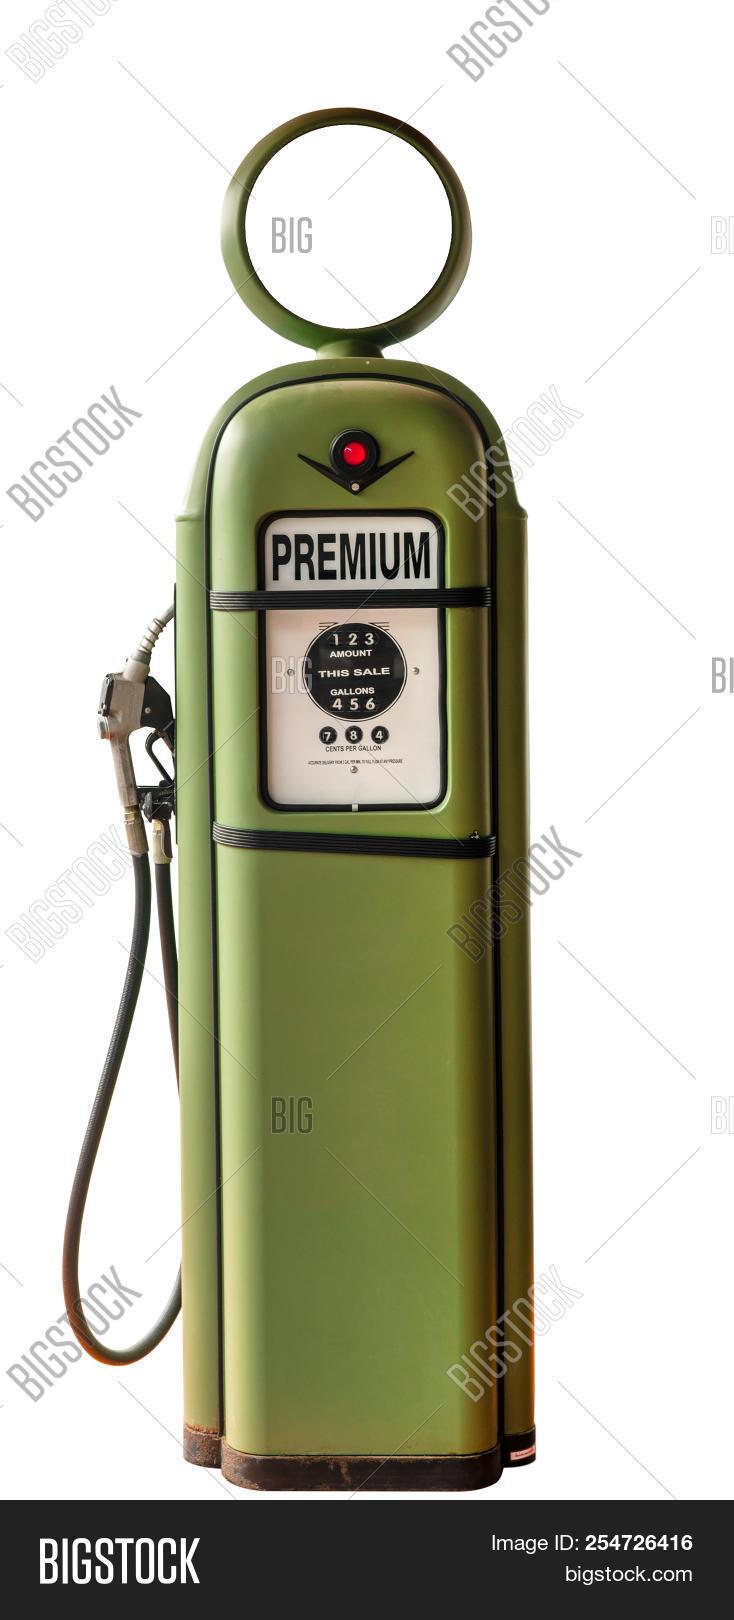 Vintage Green Gasoline Image Photo Free Trial Bigstock